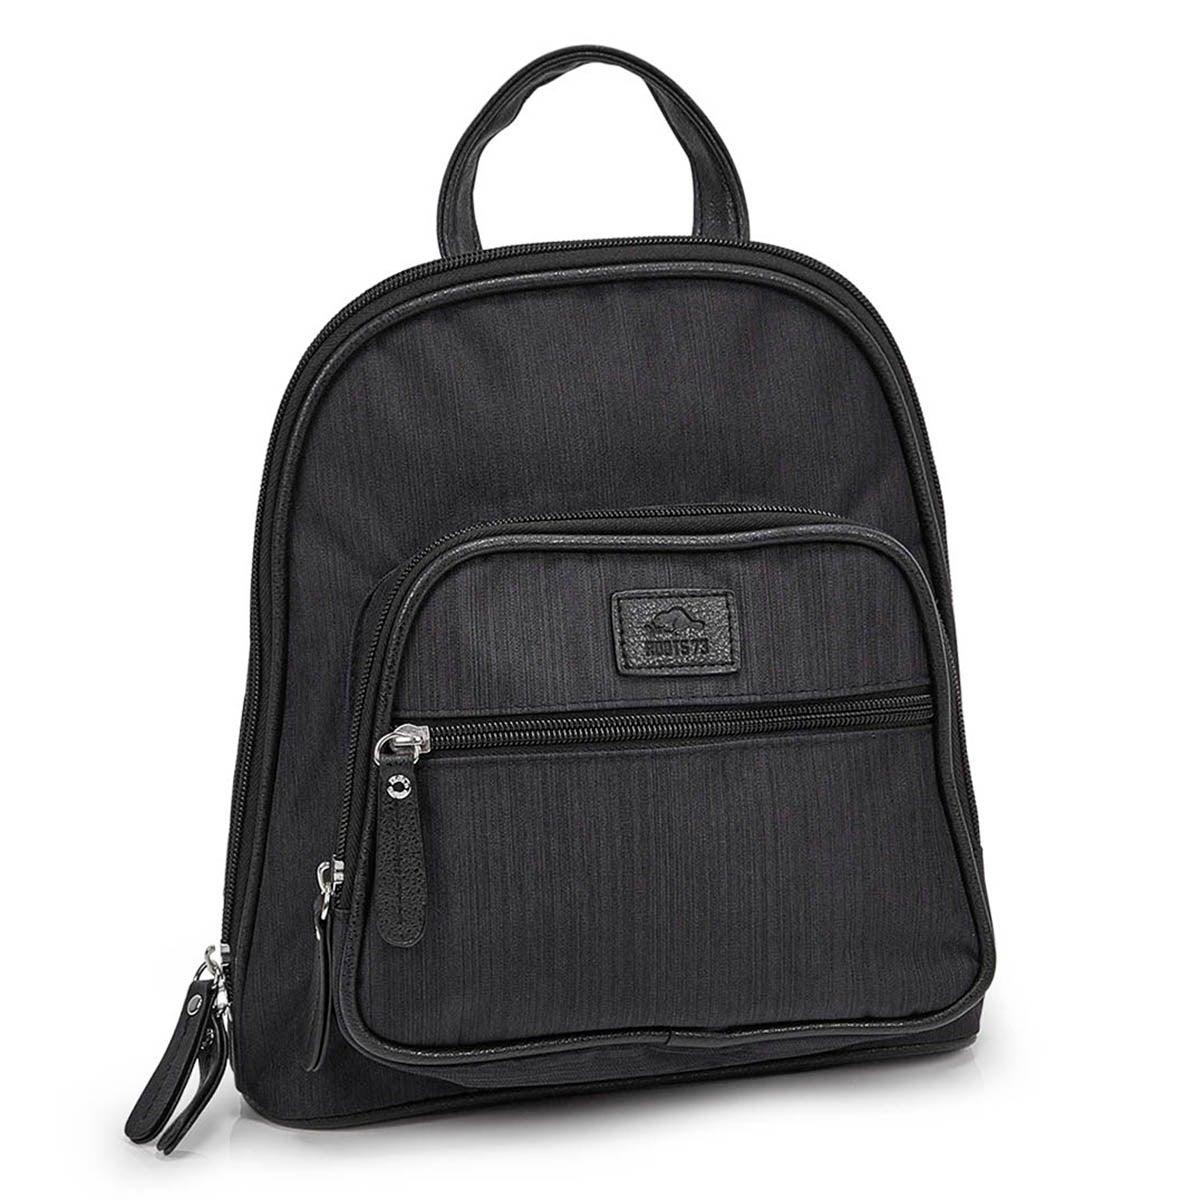 Women's R5241 black mini backpack bag